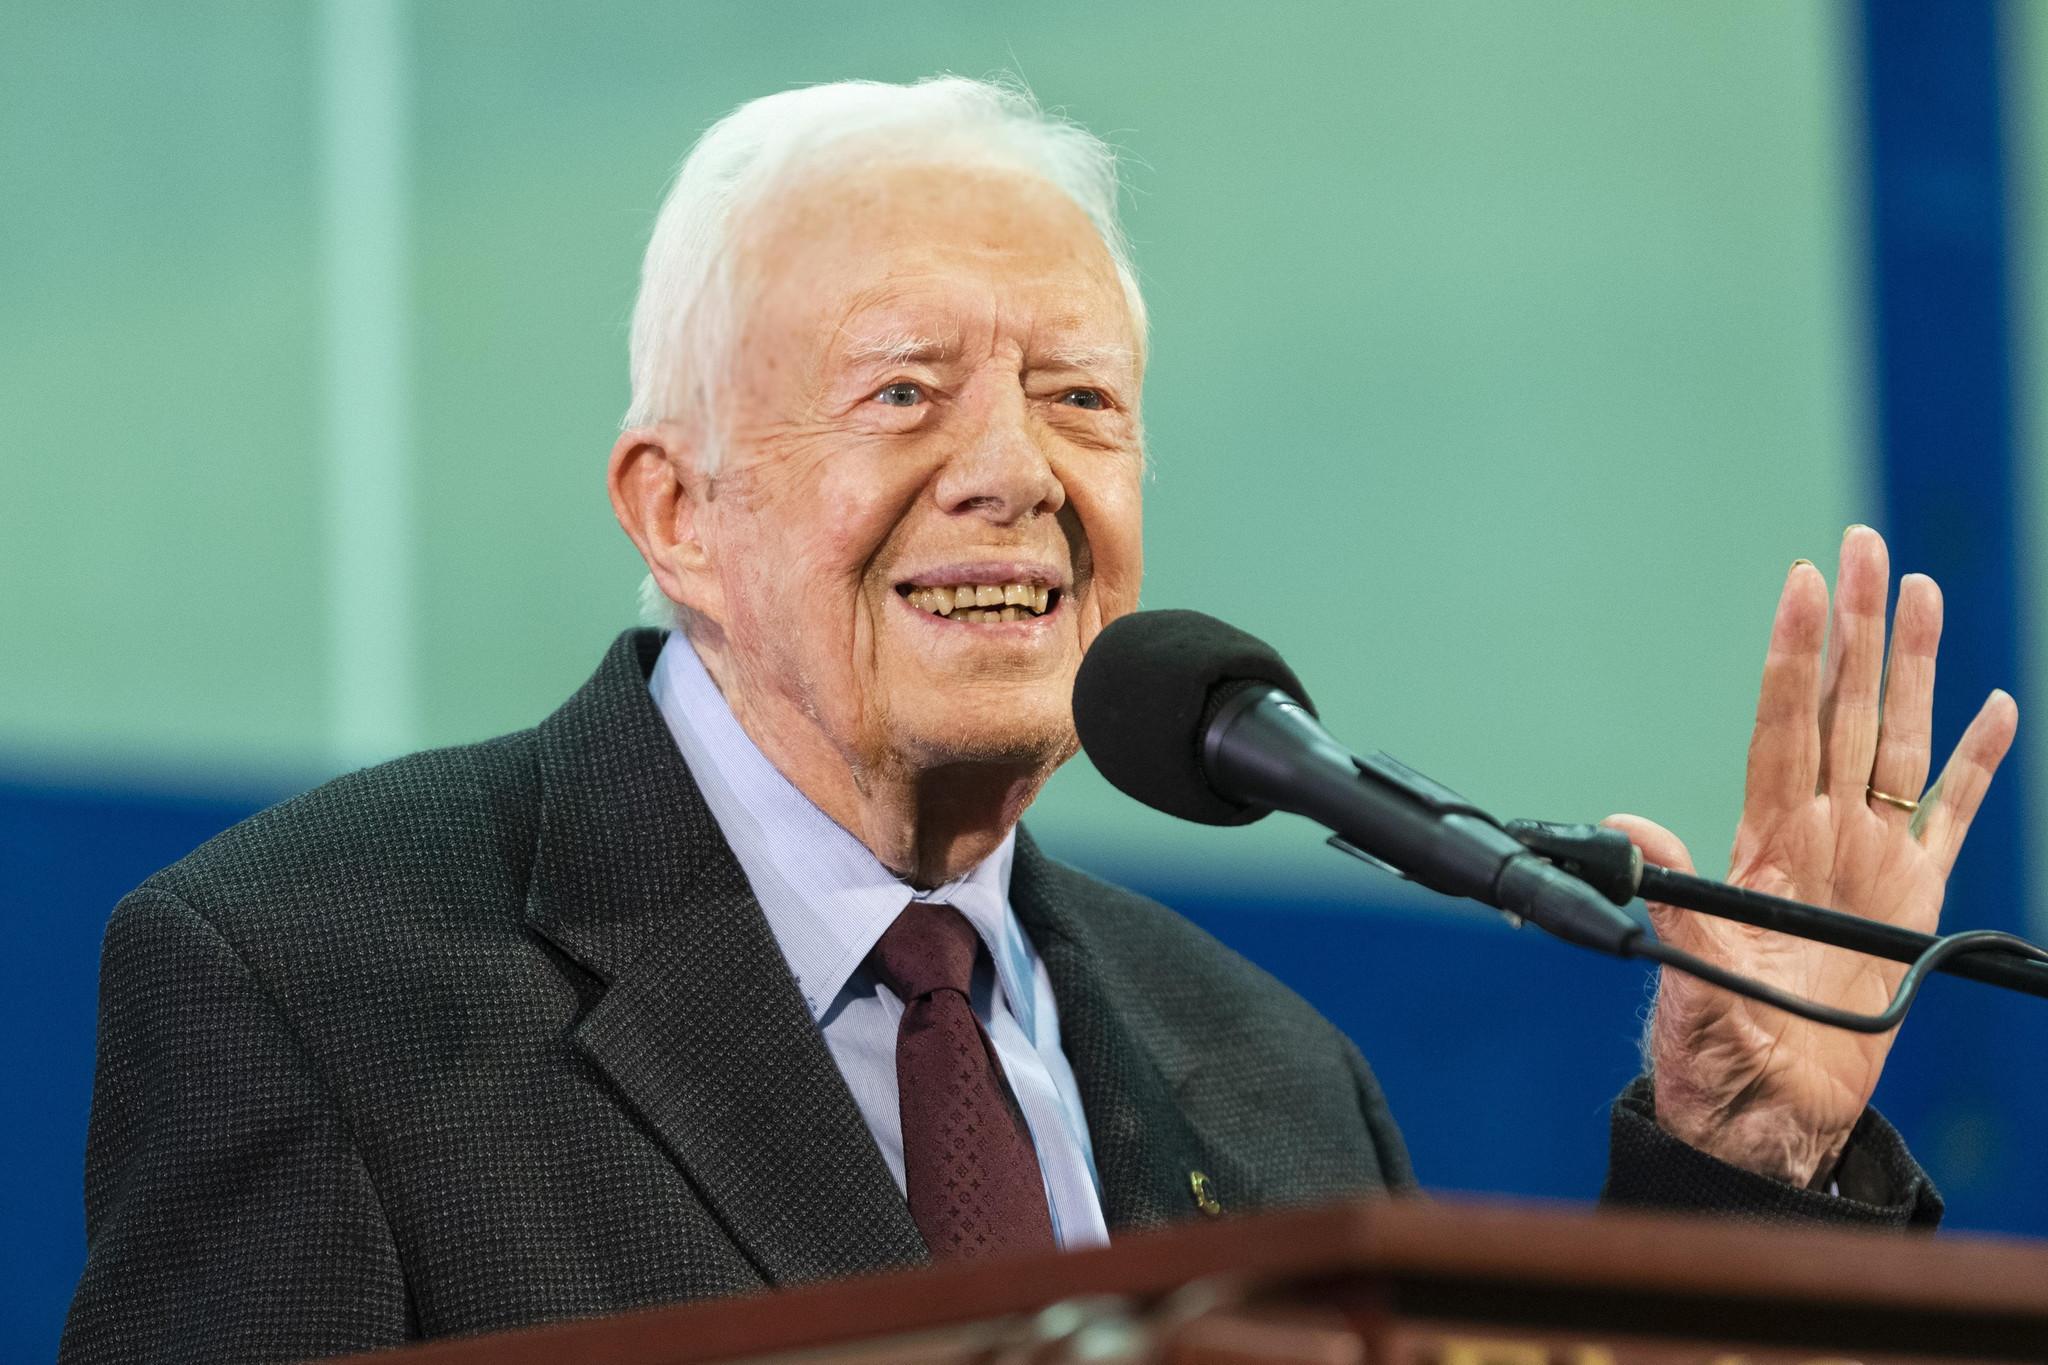 Former President Jimmy Carter leaves hospital after UTI treatment